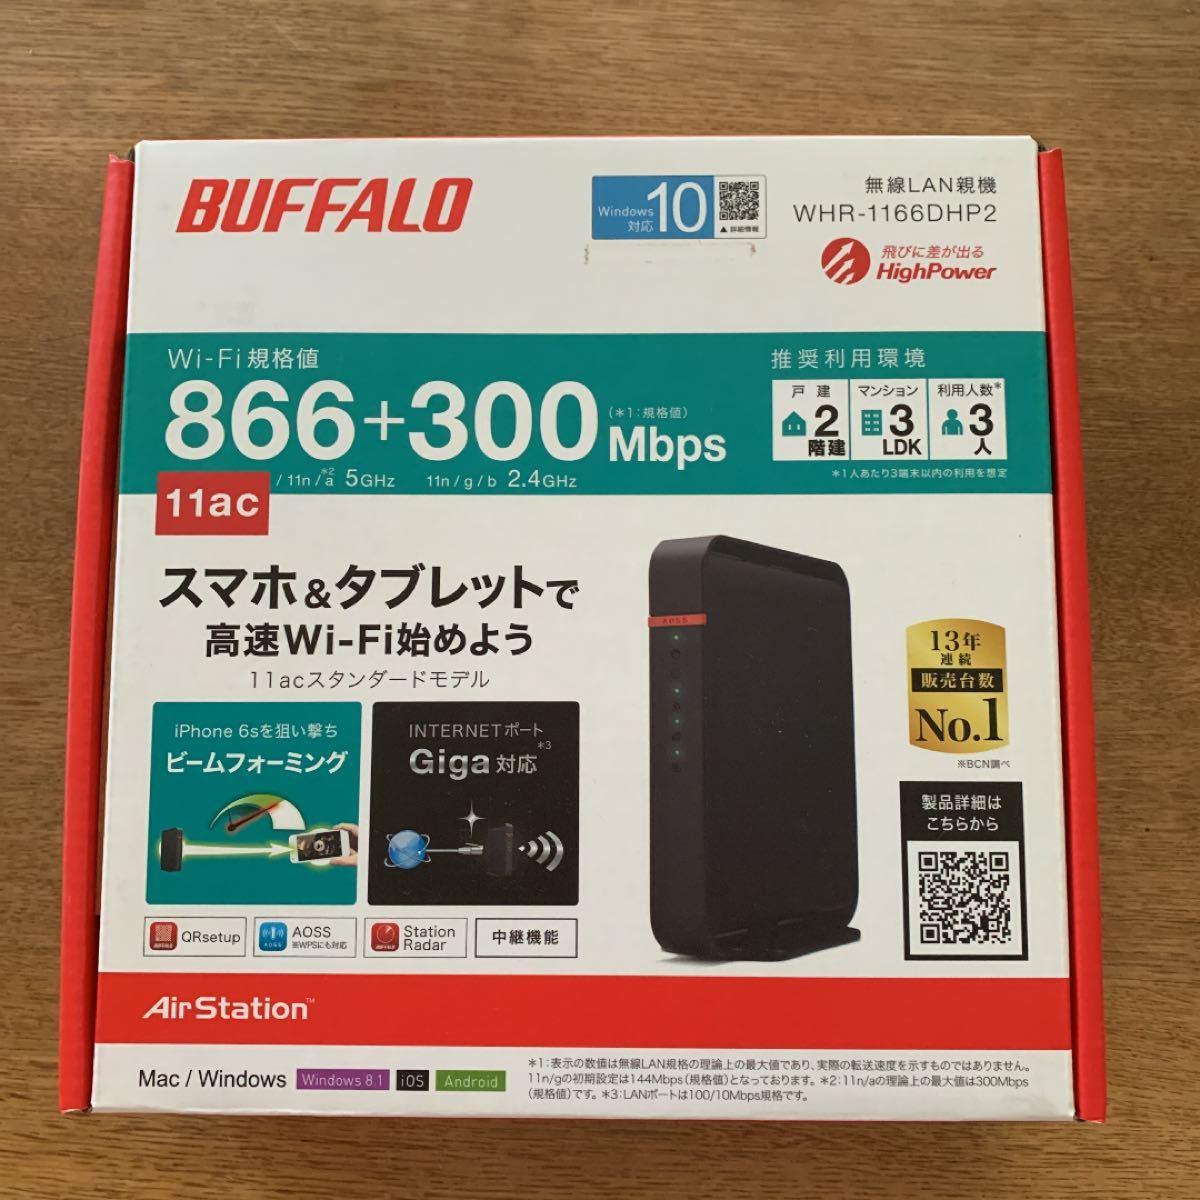 11ac/n/a/g/b 866+300Mbps 無線LAN親機 WHR-1166DHP2